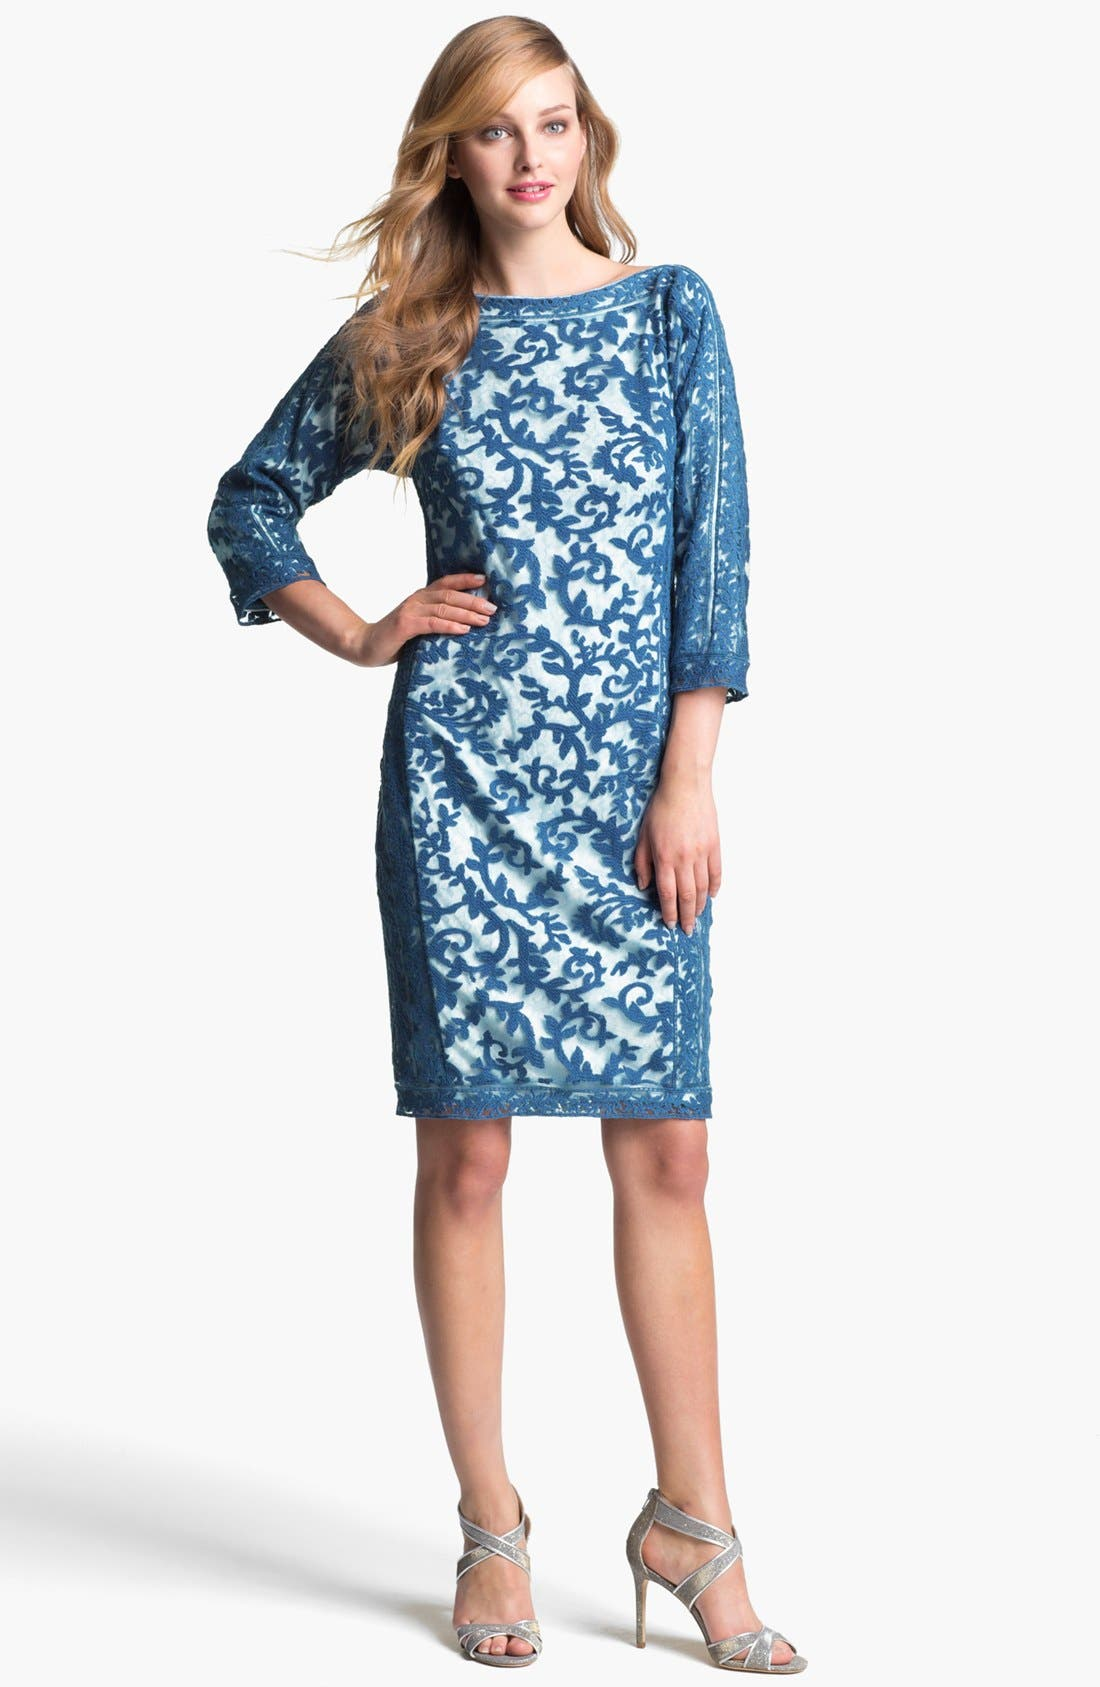 Main Image - Tadashi Shoji Embroidered Lace Dress